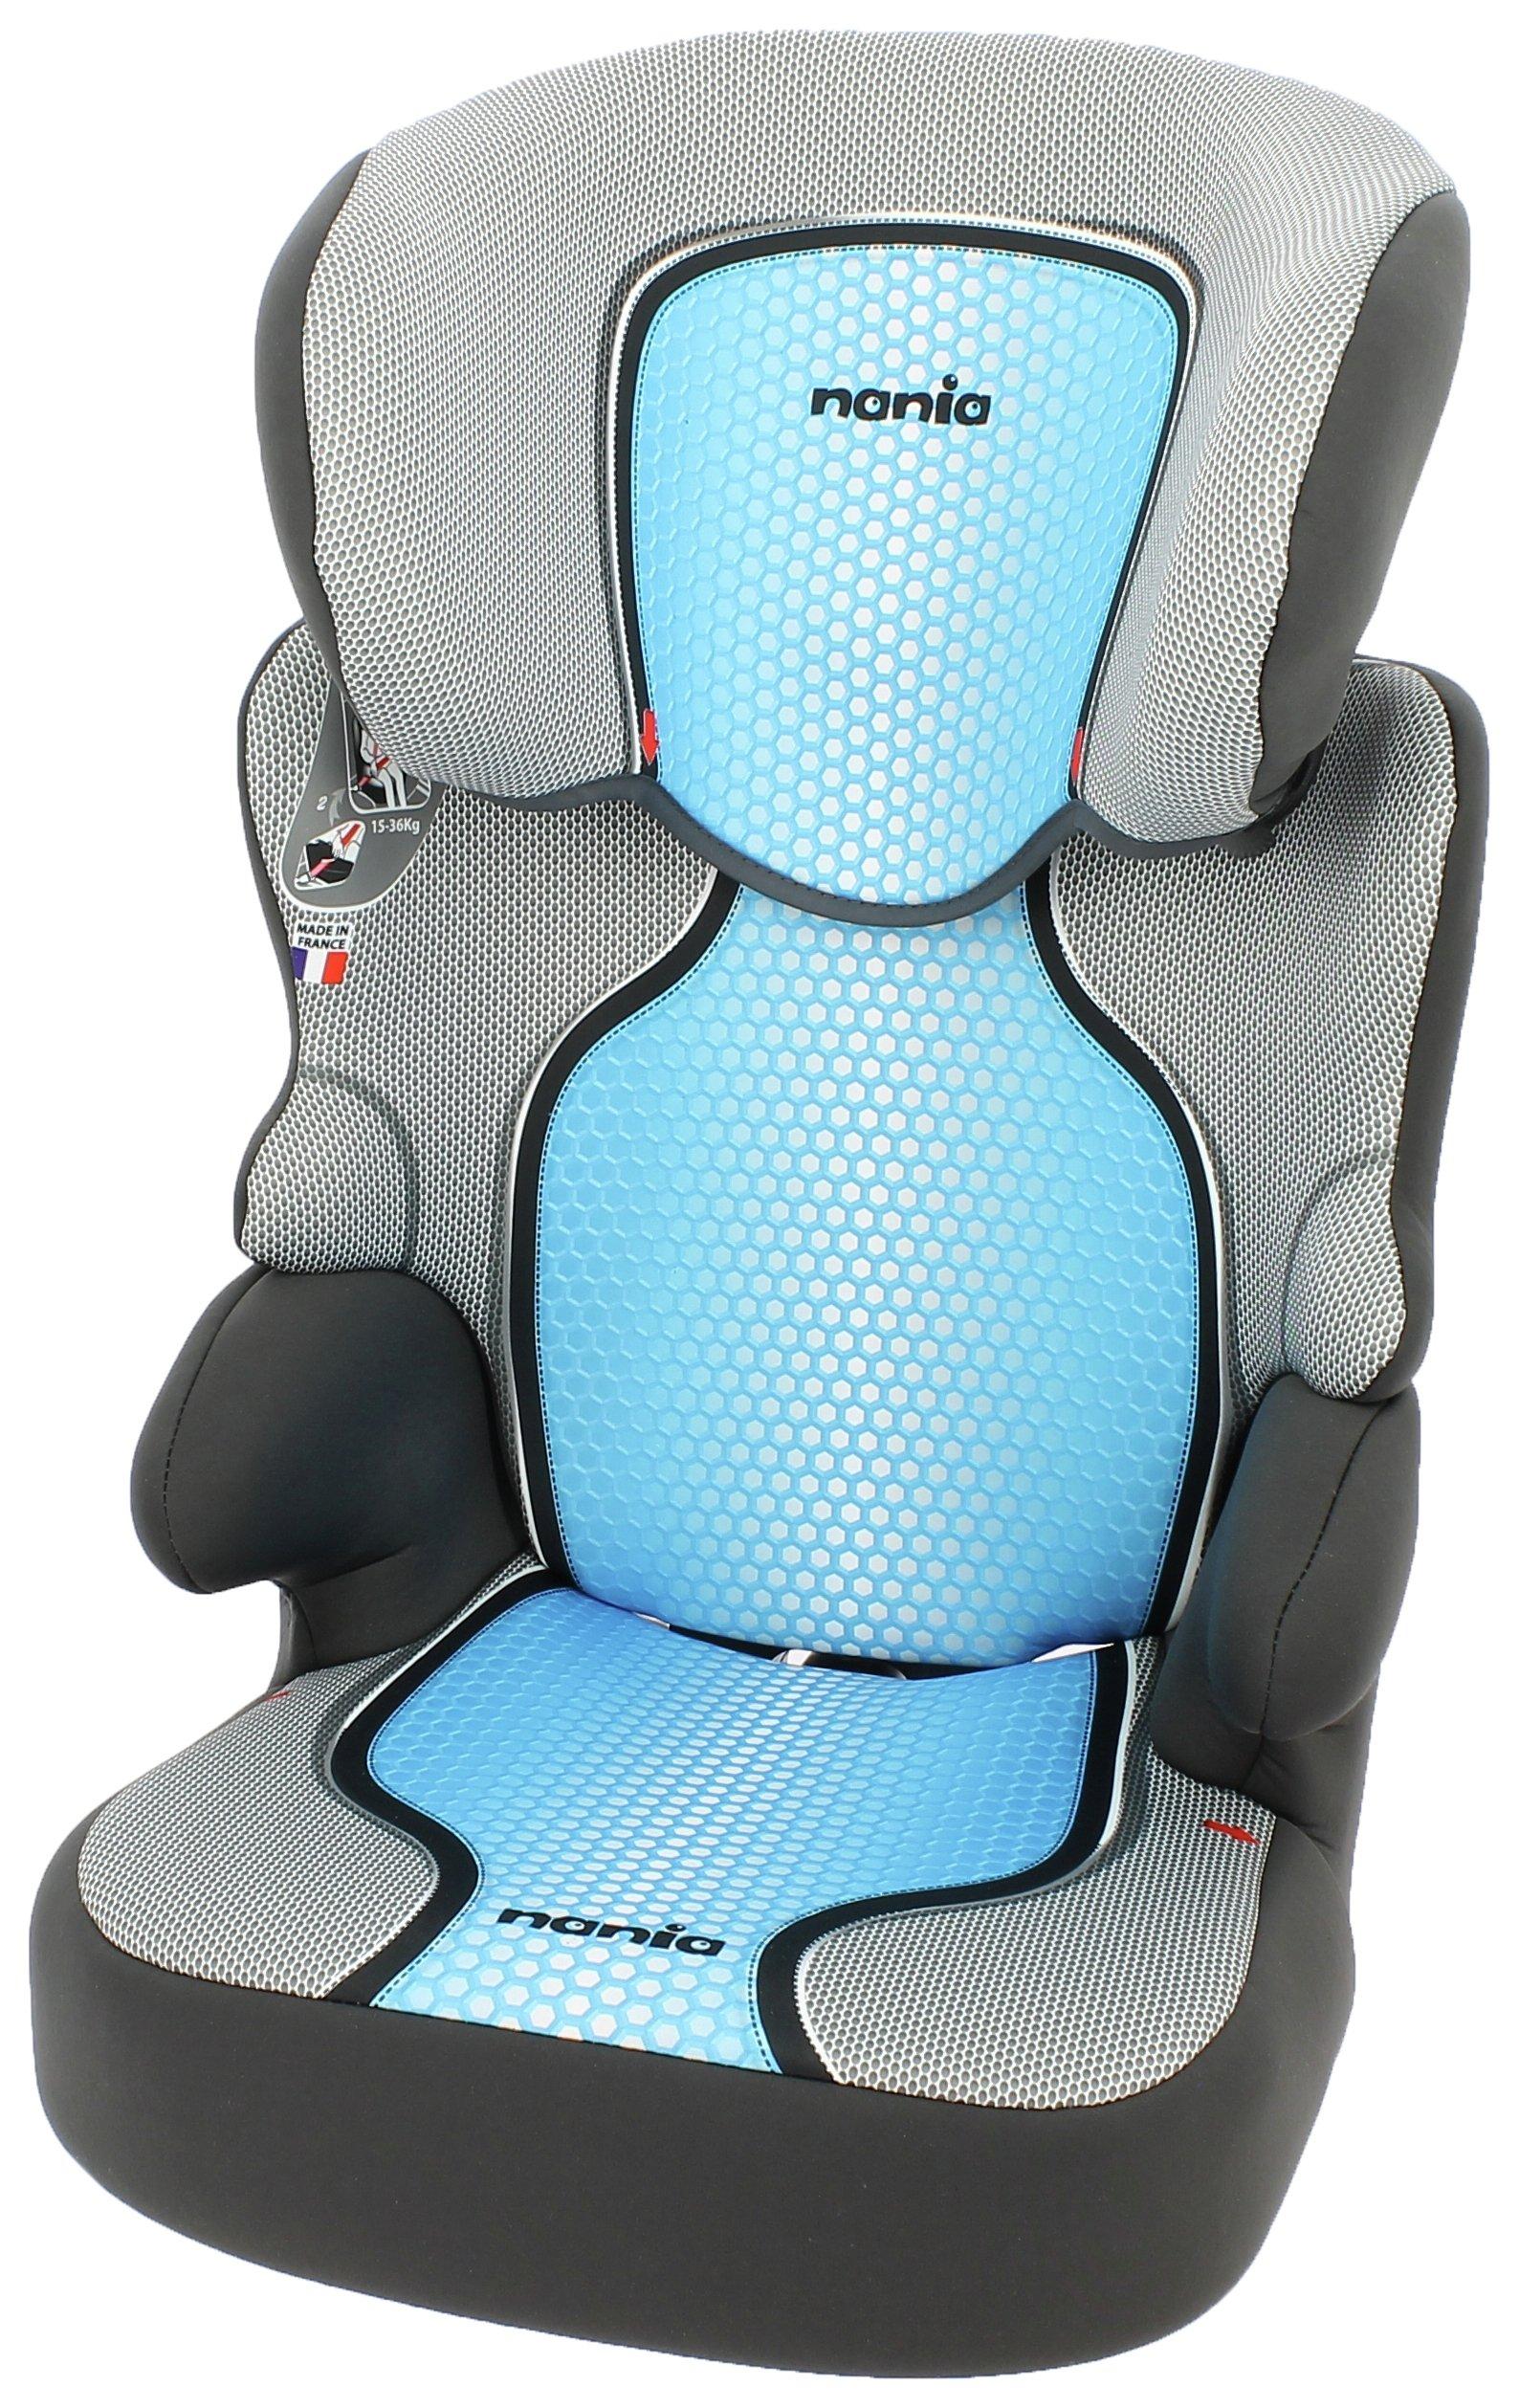 Nania Befix SP First Pop Group 2/3 Booster Car Seat - Blue